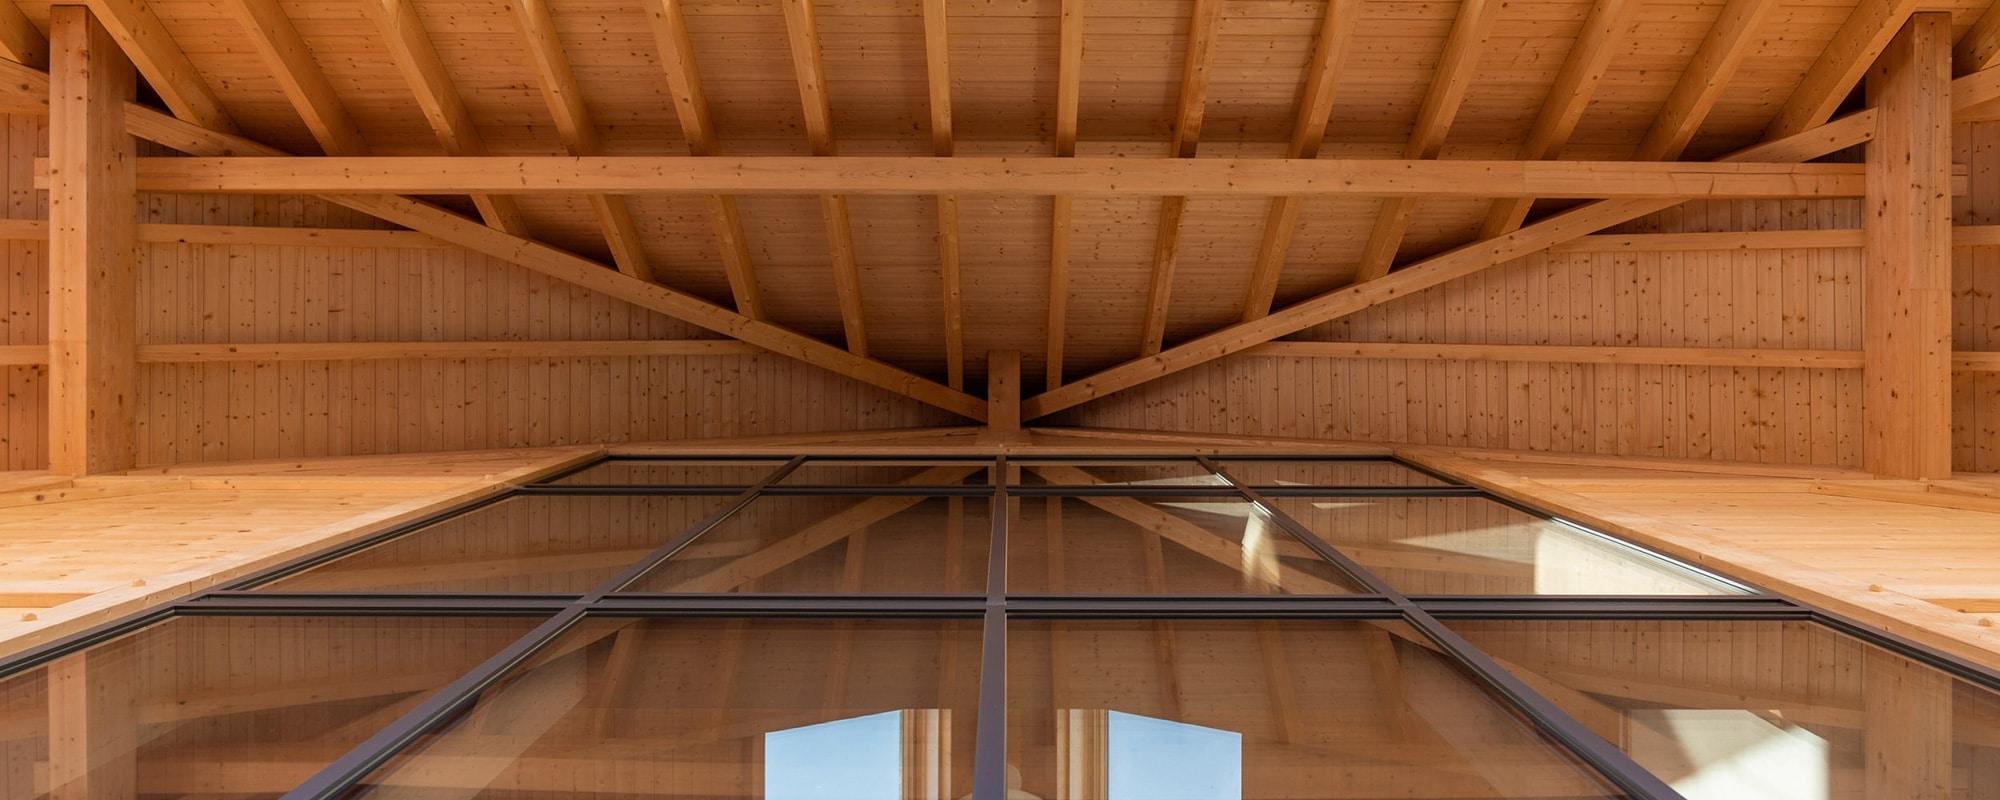 Philosophie - Holz Stahl Glas